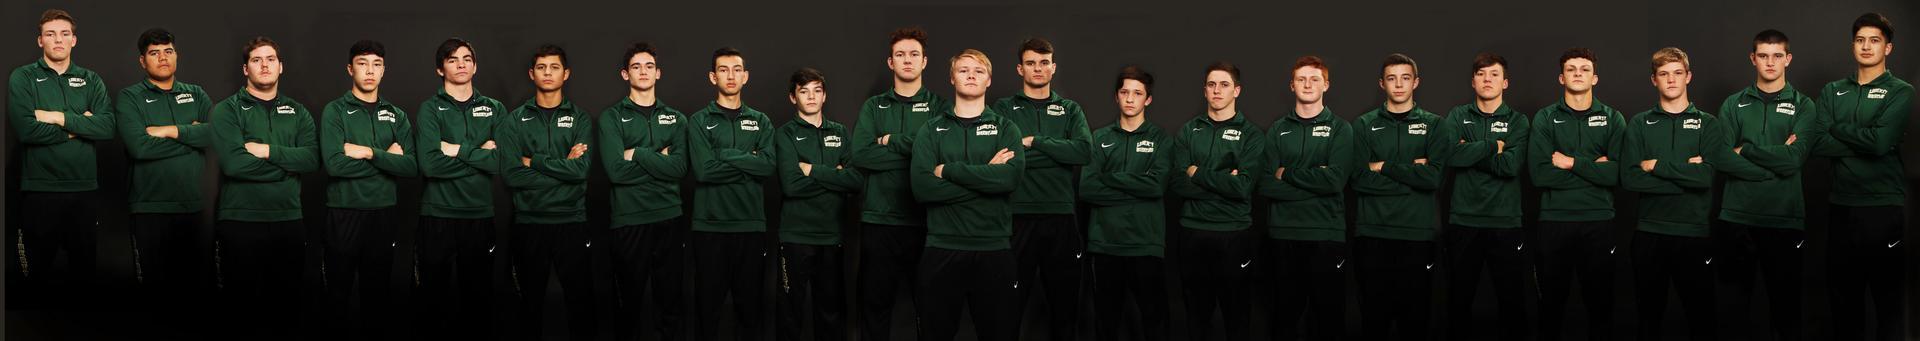 2020 Championship Team